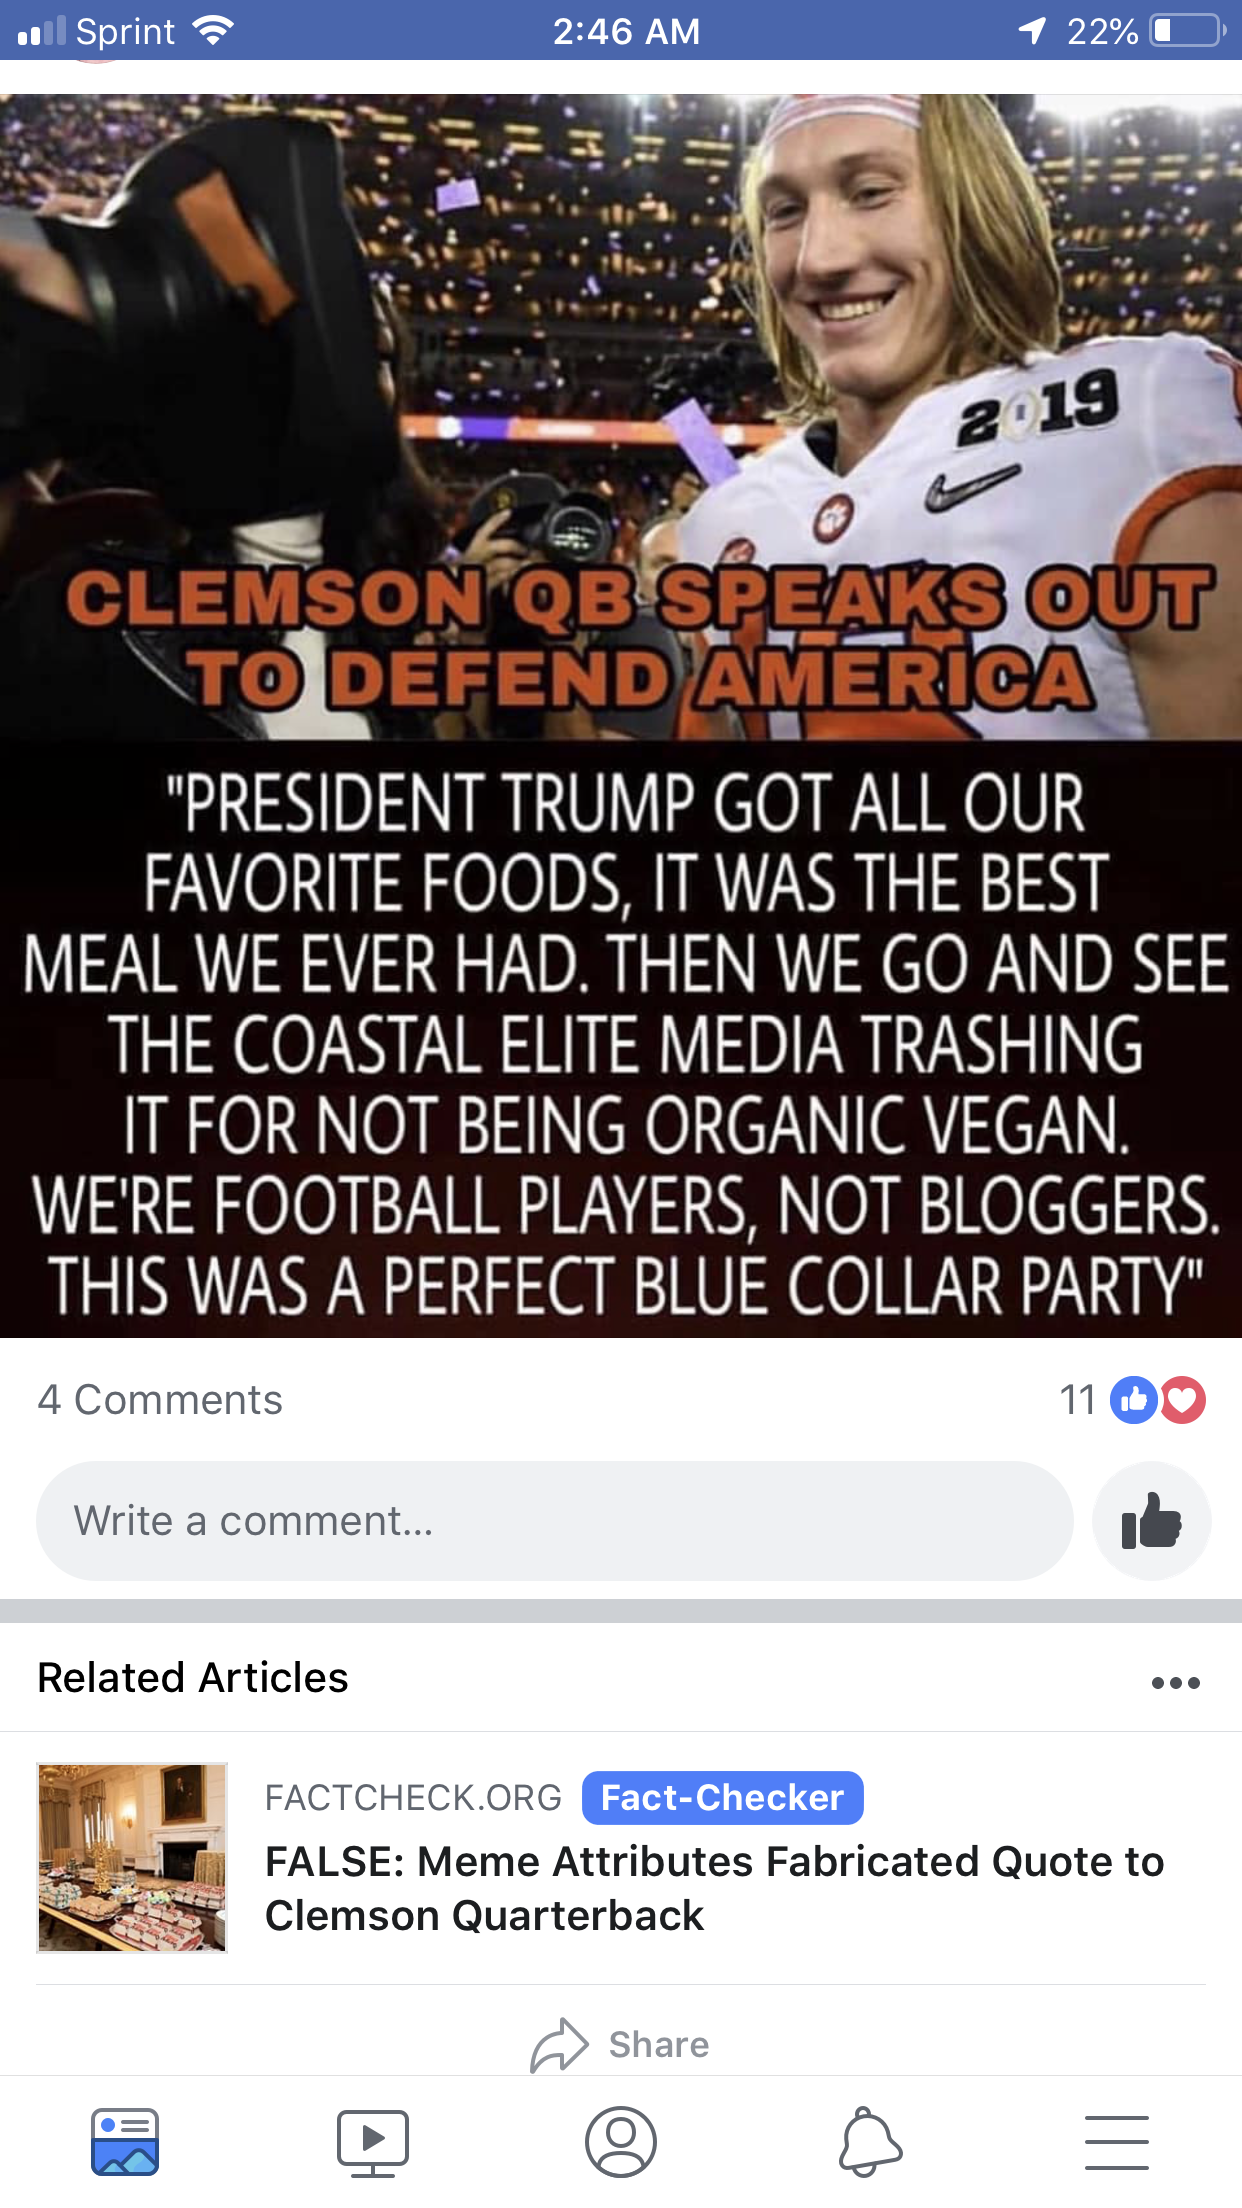 Facebook Is Stepping Up Their Game Fact Checking Memes My Screenshot Organic Vegan Football Players Favorite Recipes